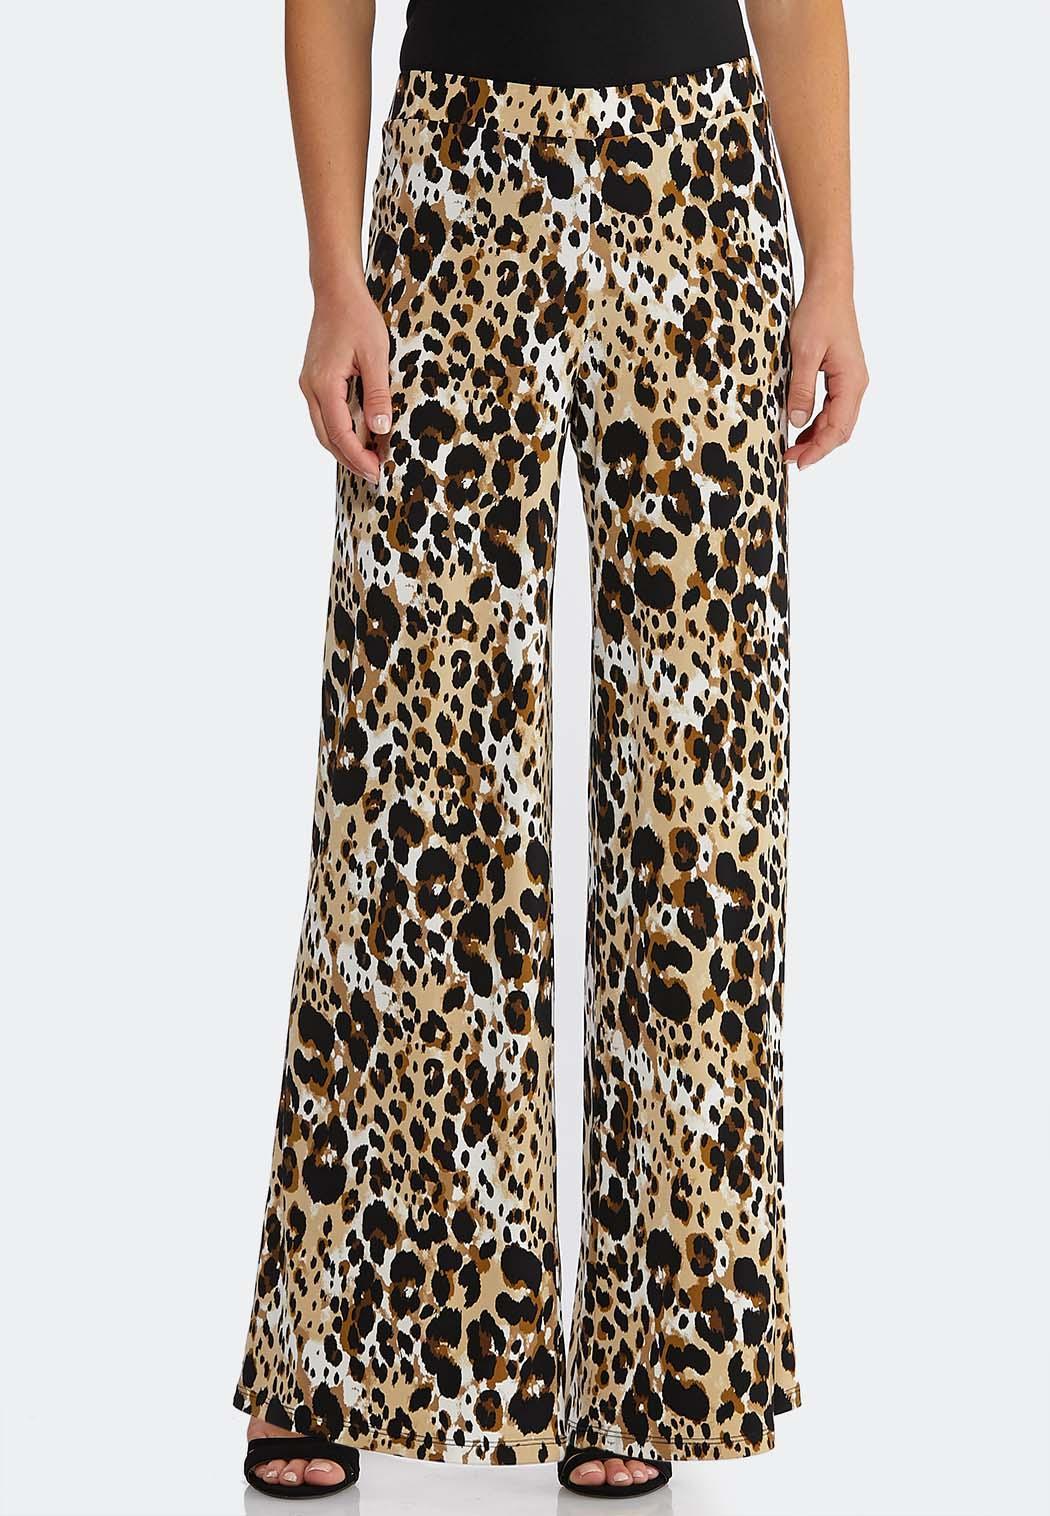 Petite Breezy Leopard Palazzo Pants